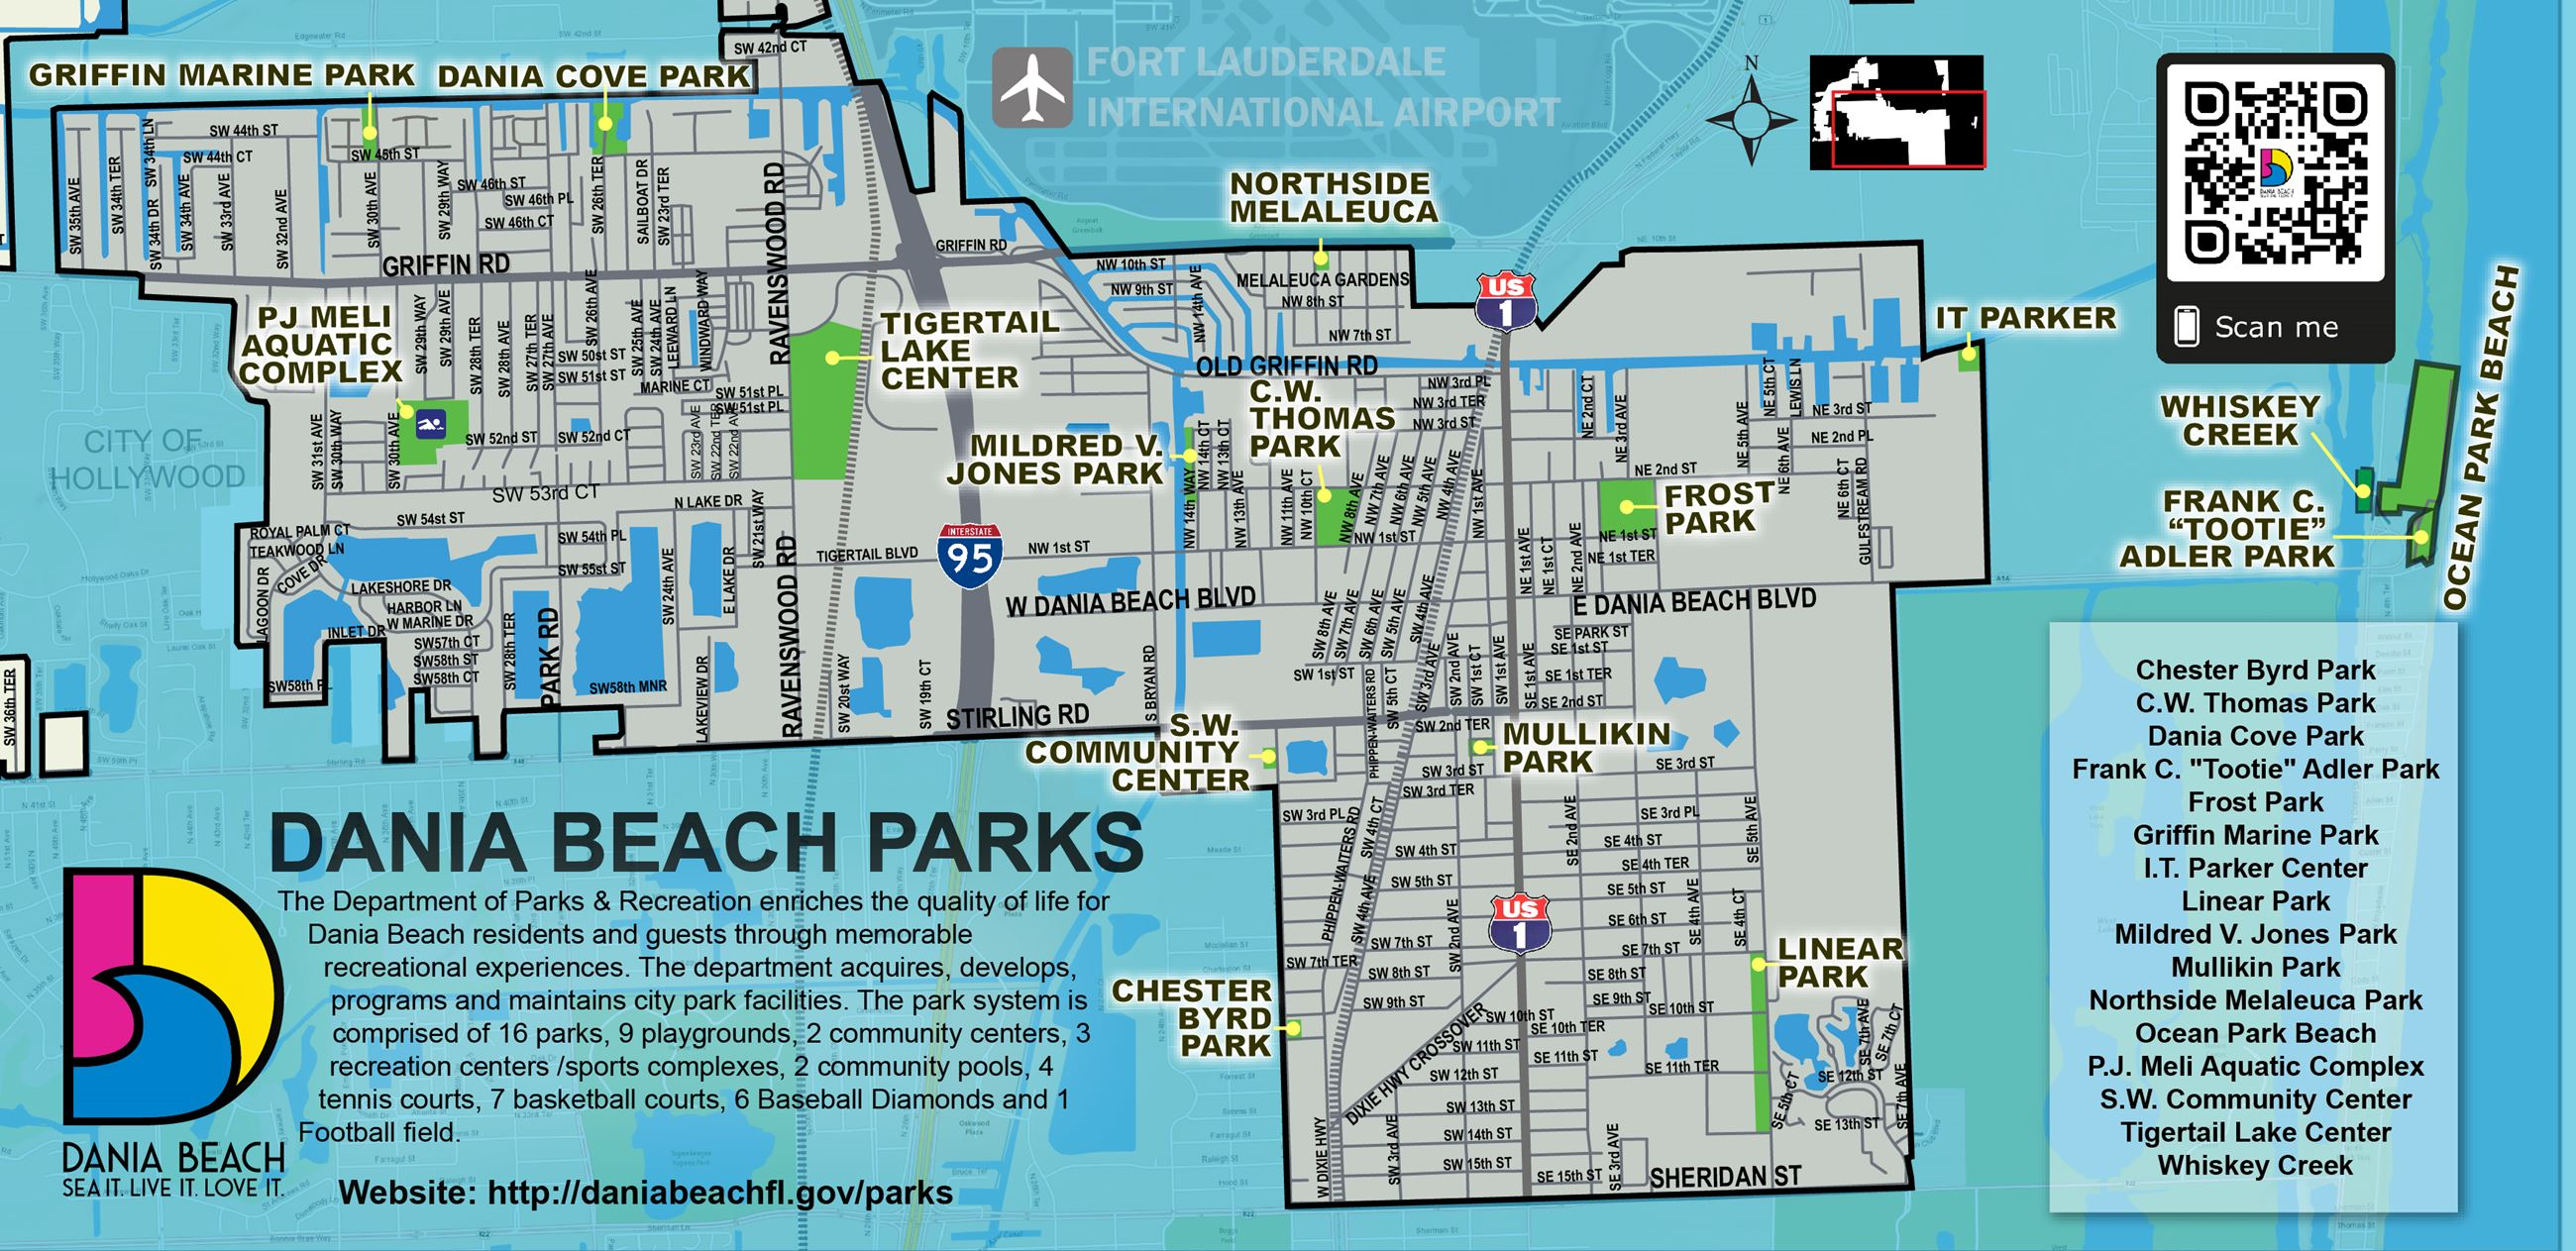 Dania Beach Florida Map.Frost Park Activities Calendar City Of Dania Beach Florida